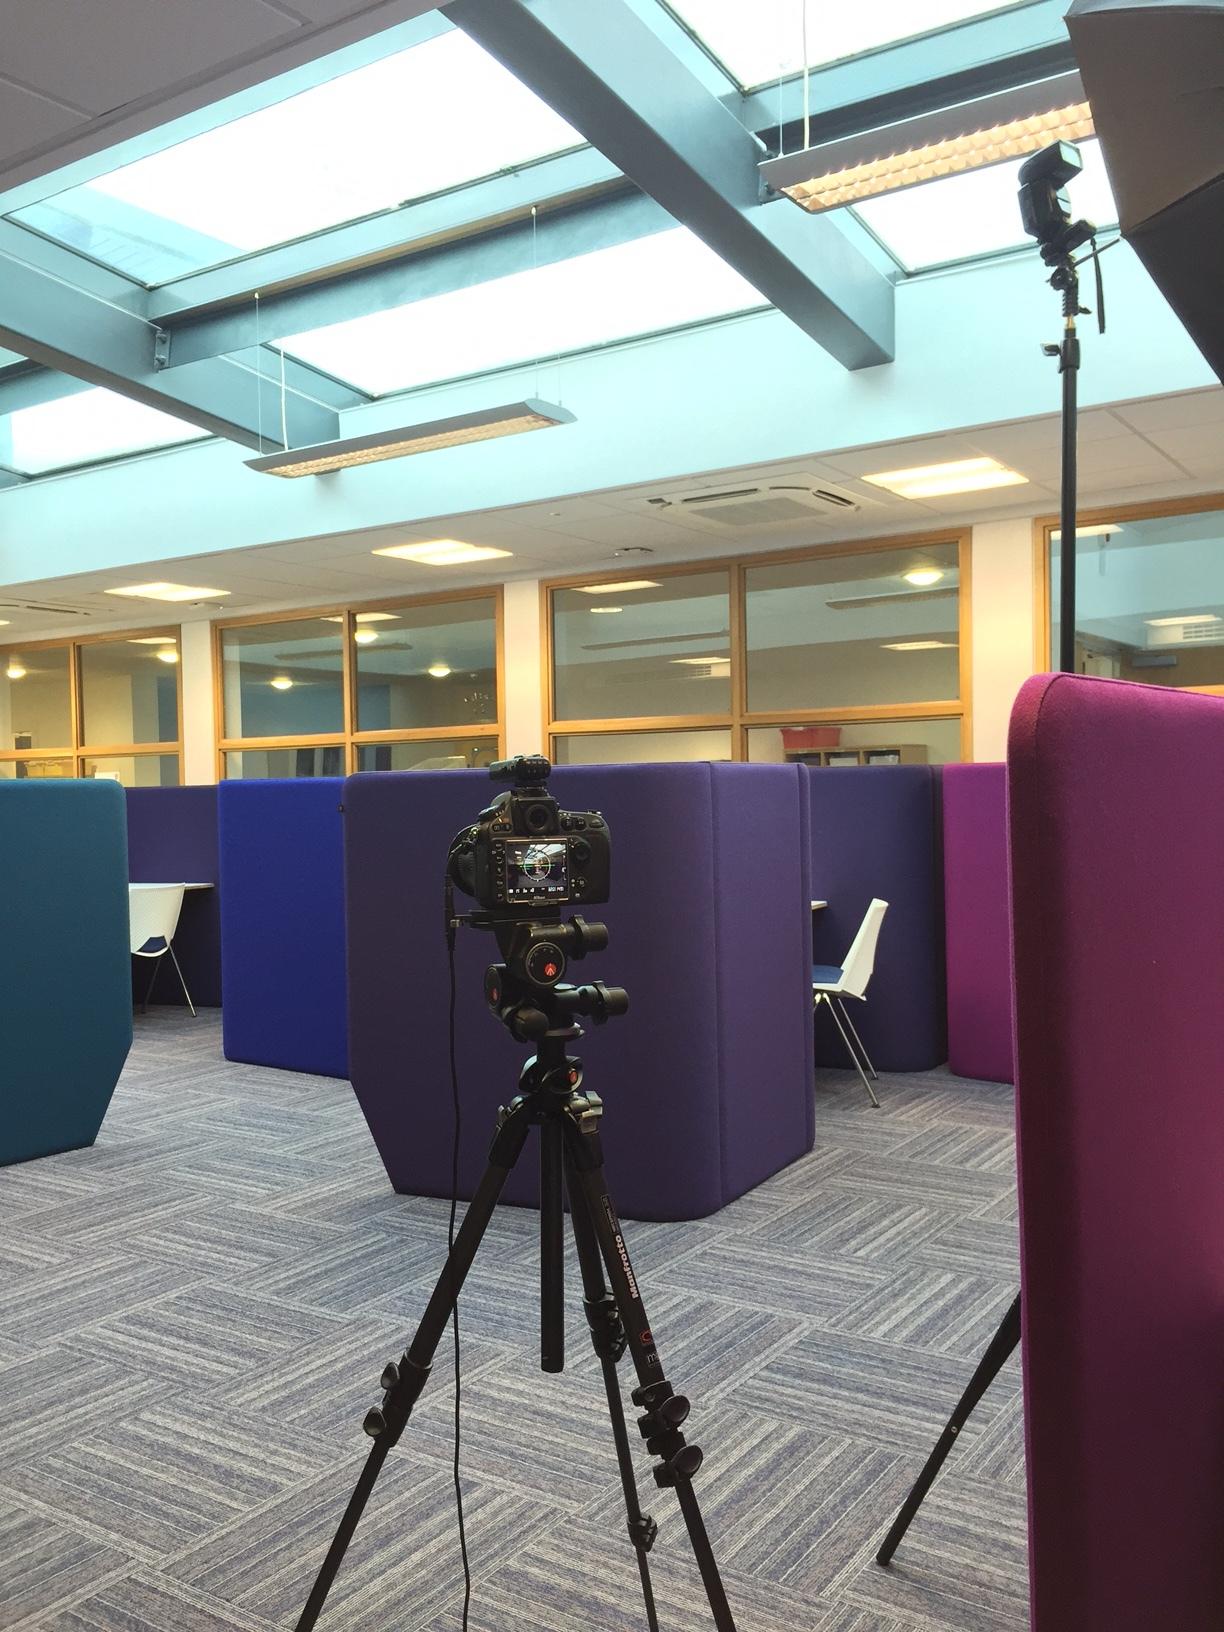 BTS image from recent interior shoot for Robertson Construction Ltd.